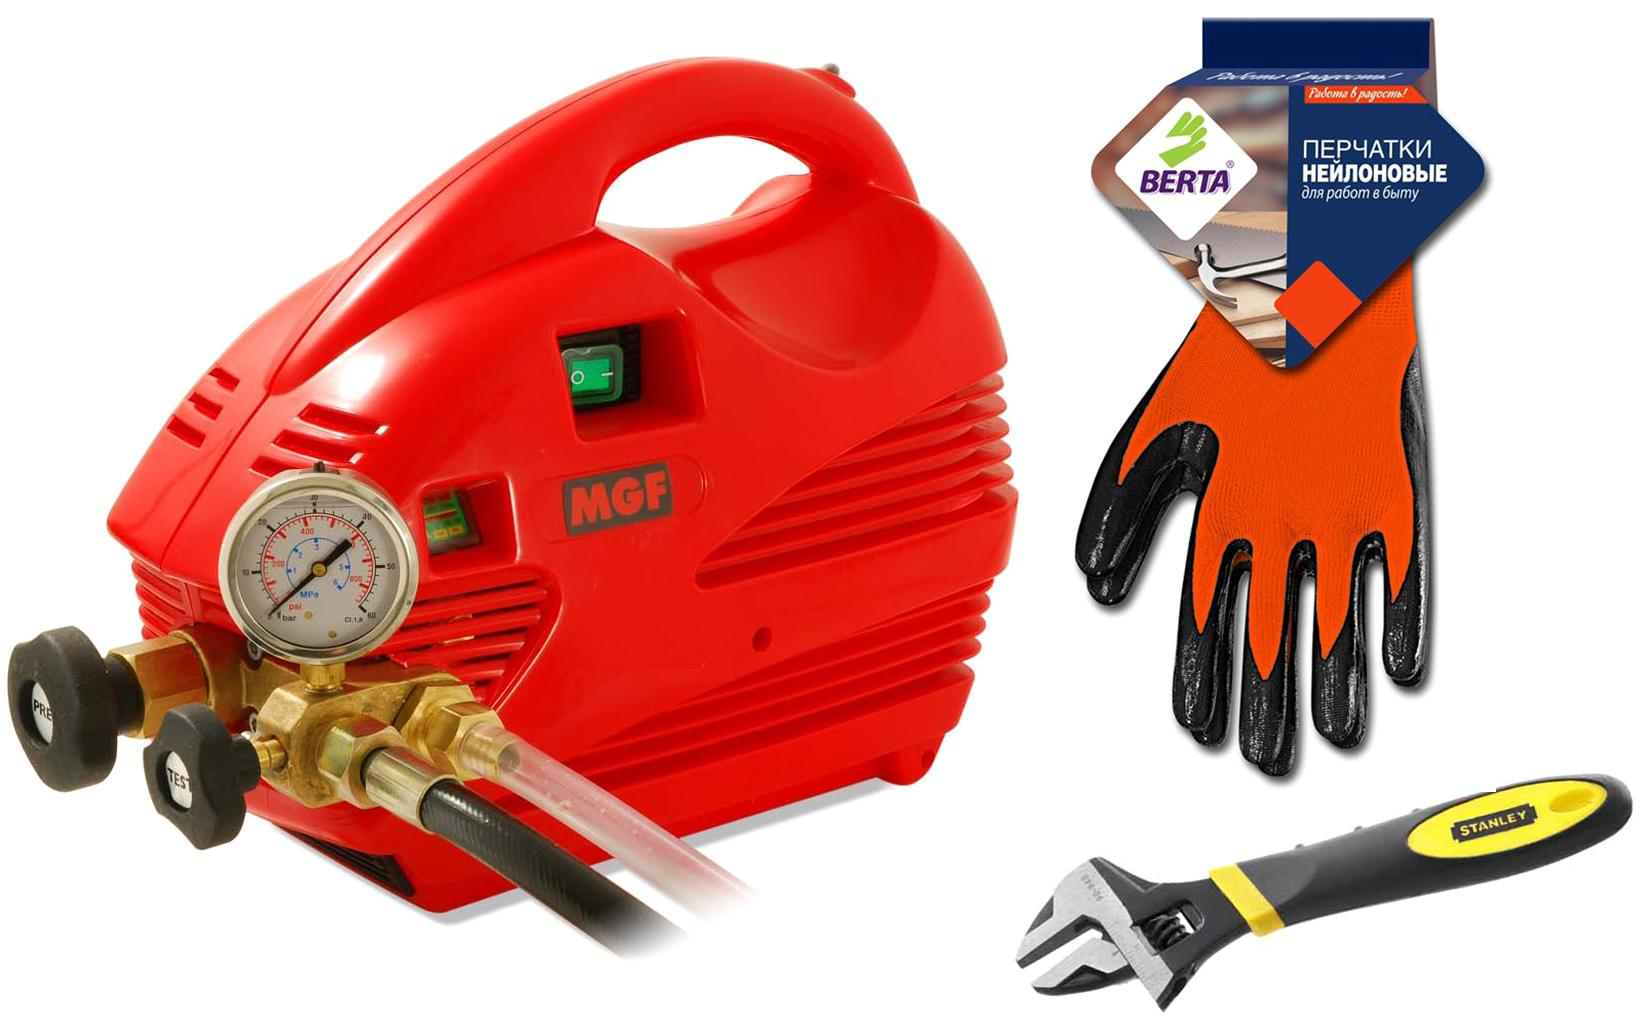 Набор Mgf Опрессовщик compact 60 905200 +Ключ 'maxsteel'' 0-90-947 (0 - 24 мм) +Перчатки 280